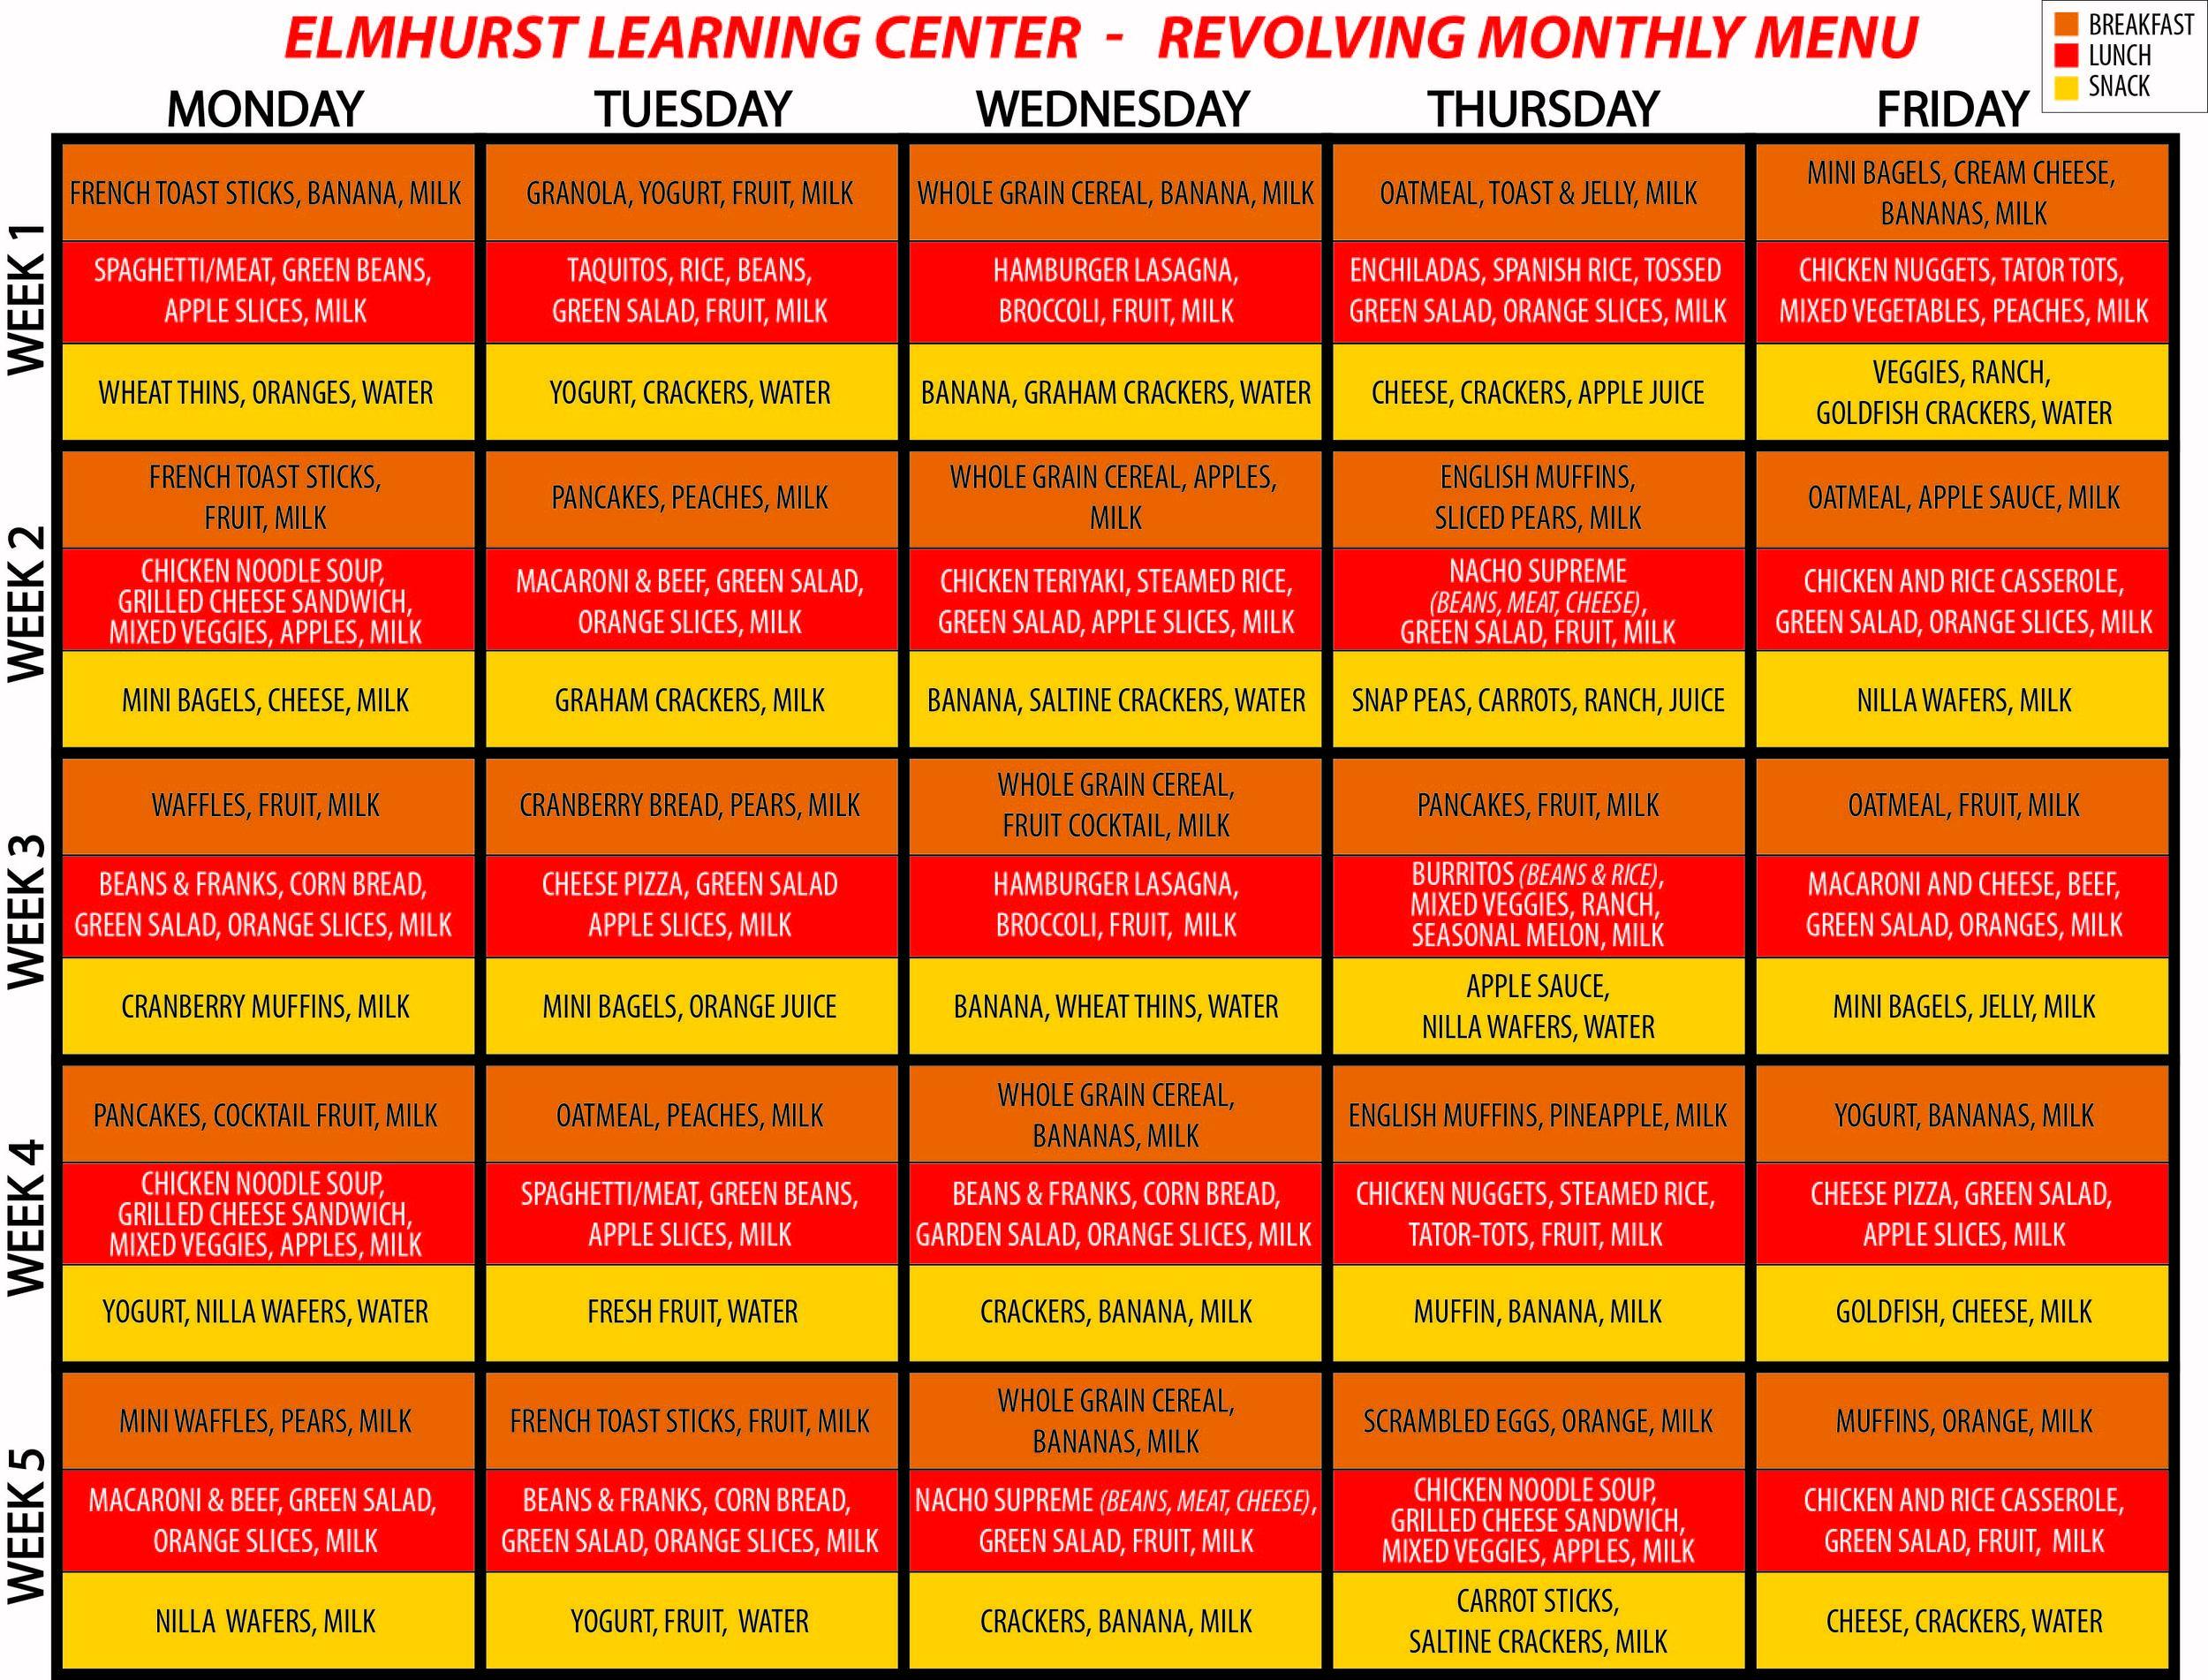 Menu - Revolving Monthly WINTER 2014.jpg